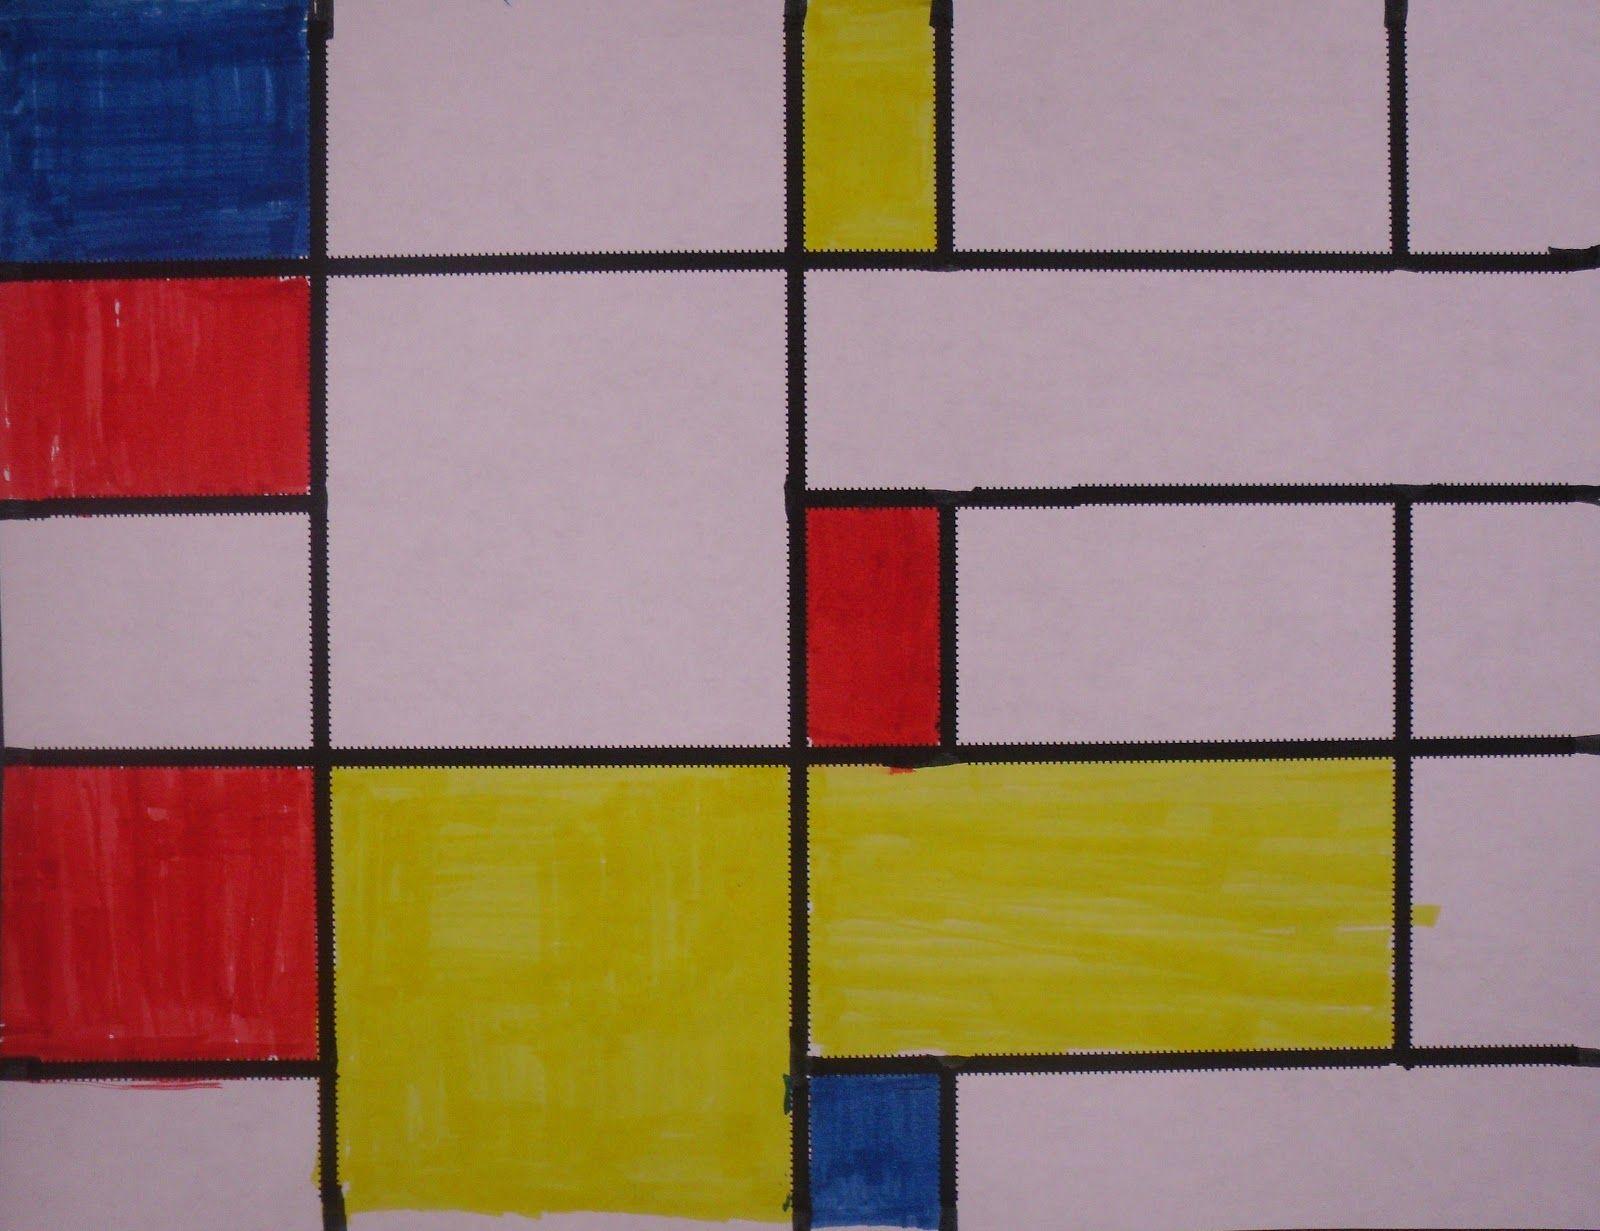 ARTventurous: Primary Colours and Piet Mondrian